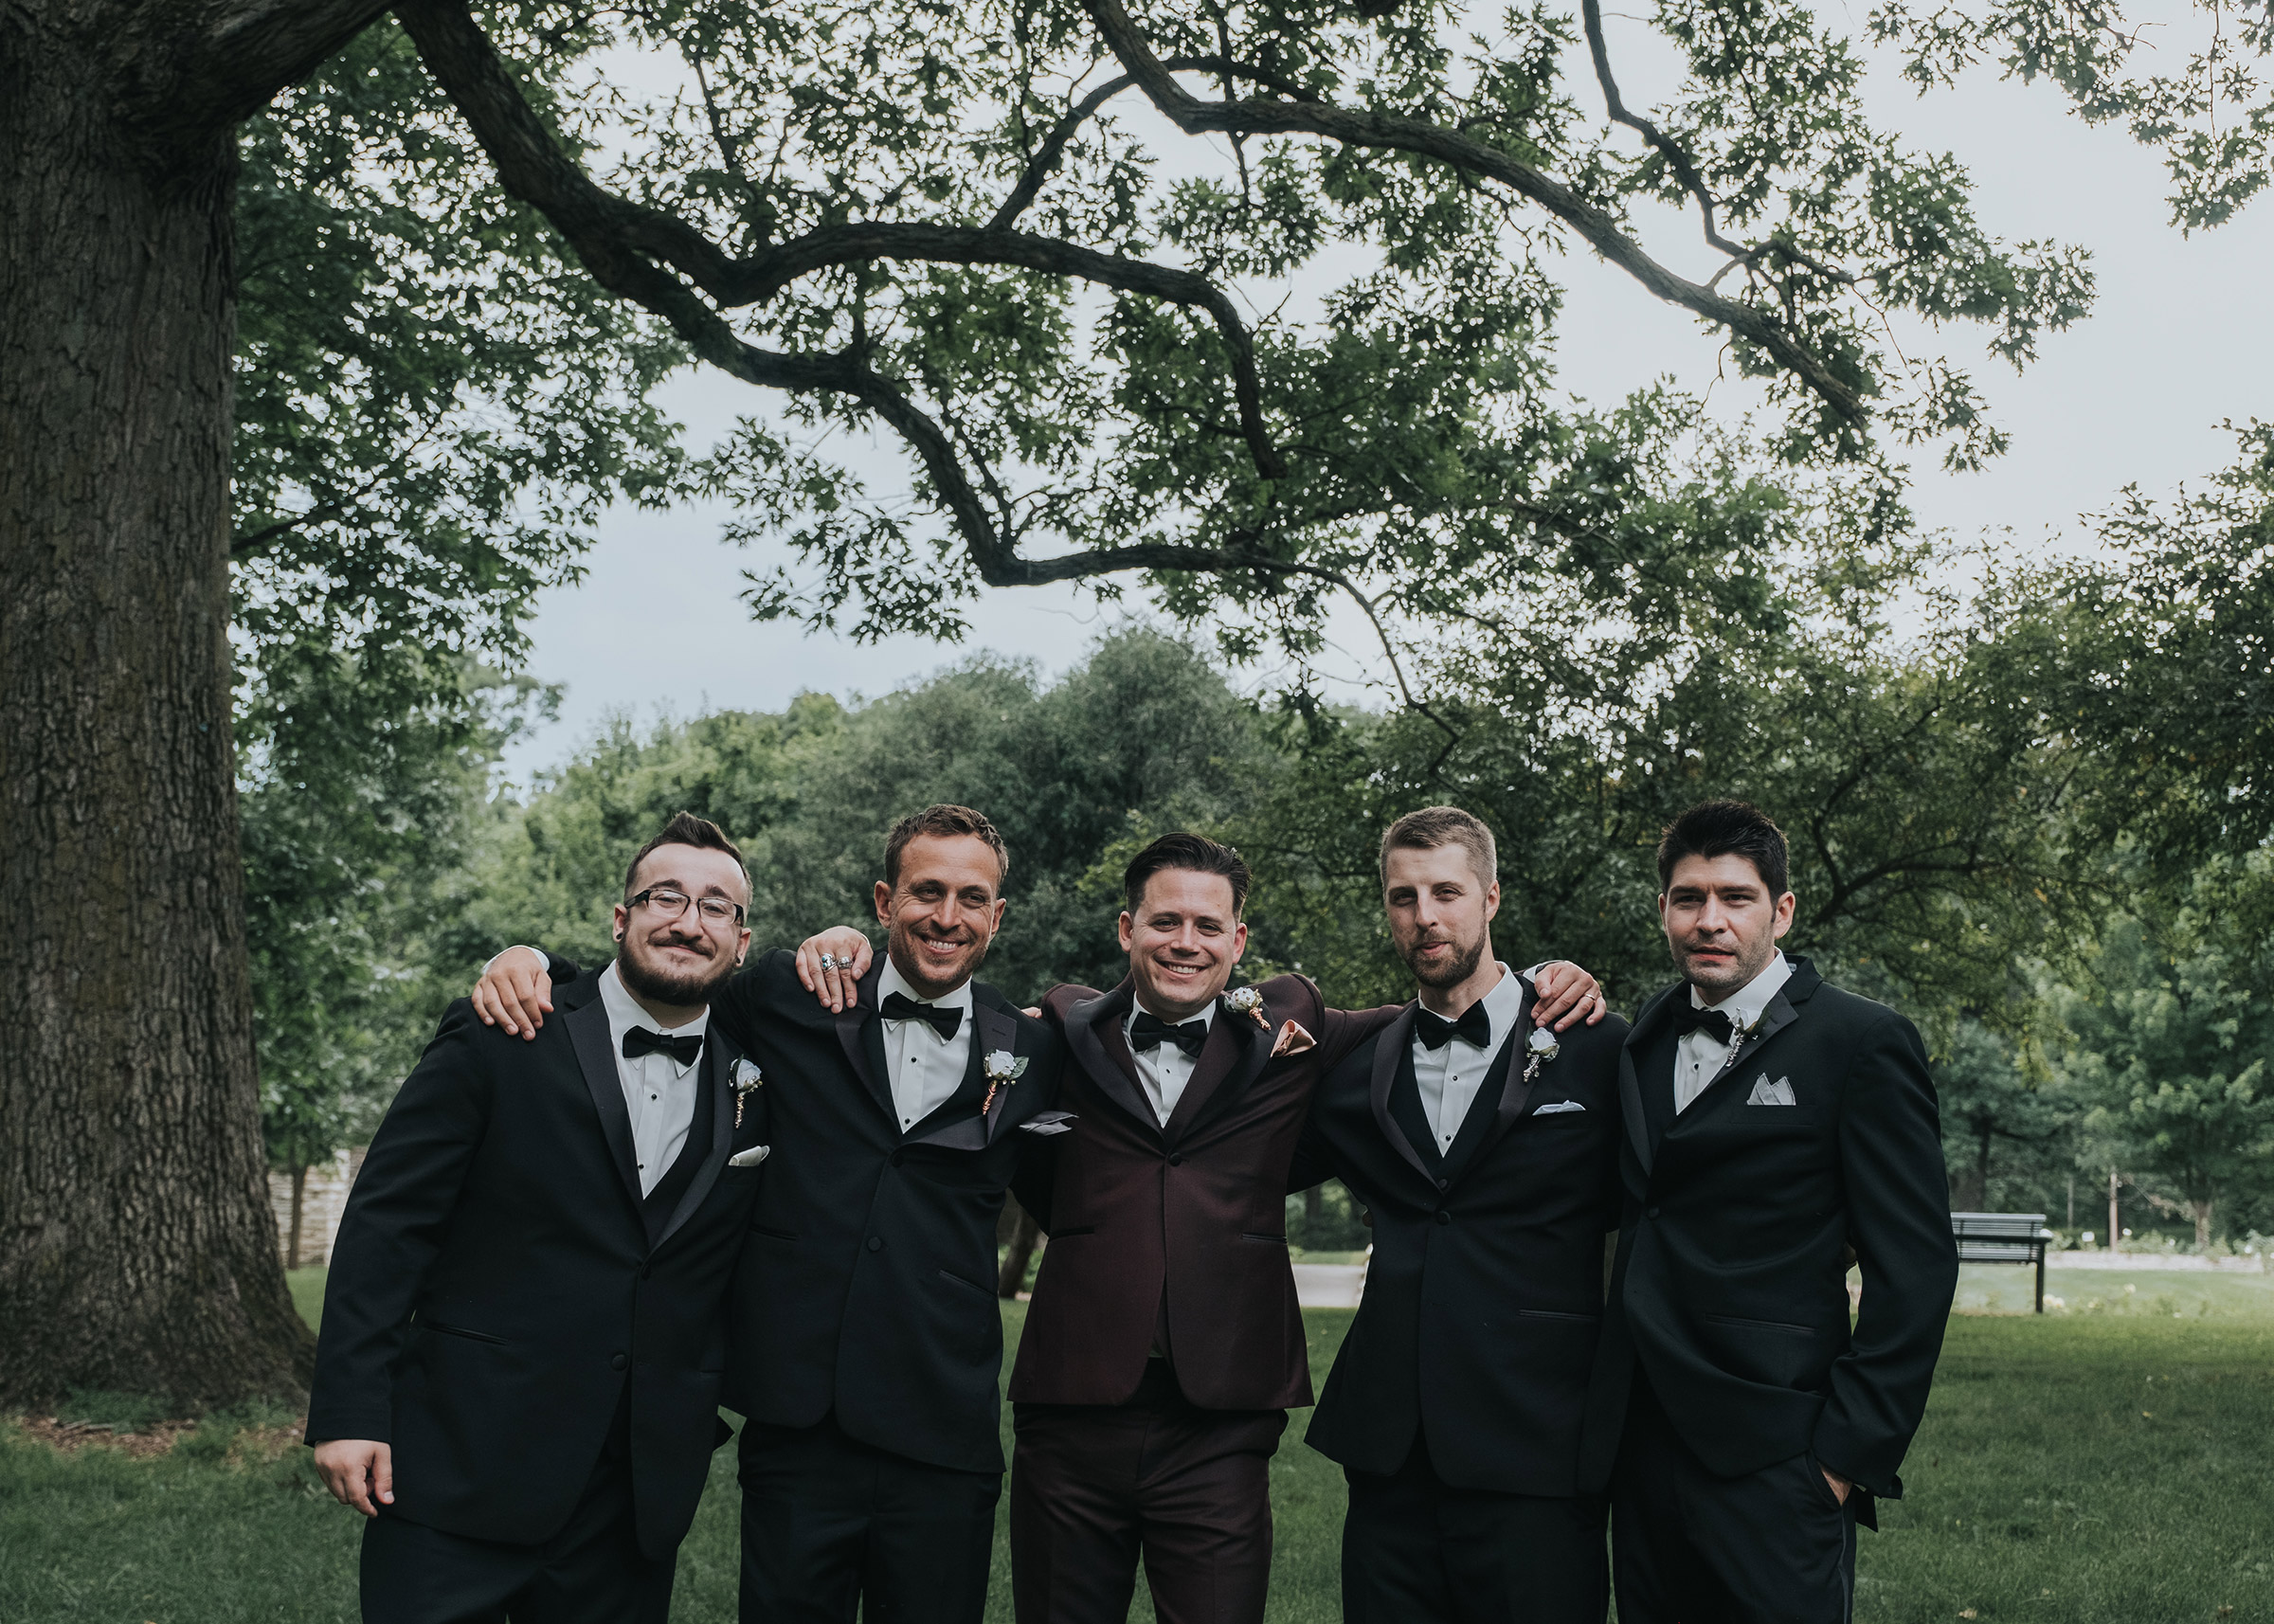 groom-with-arms-around-groomsmen-desmoines-iowa-art-center-raelyn-ramey-photography.jpg